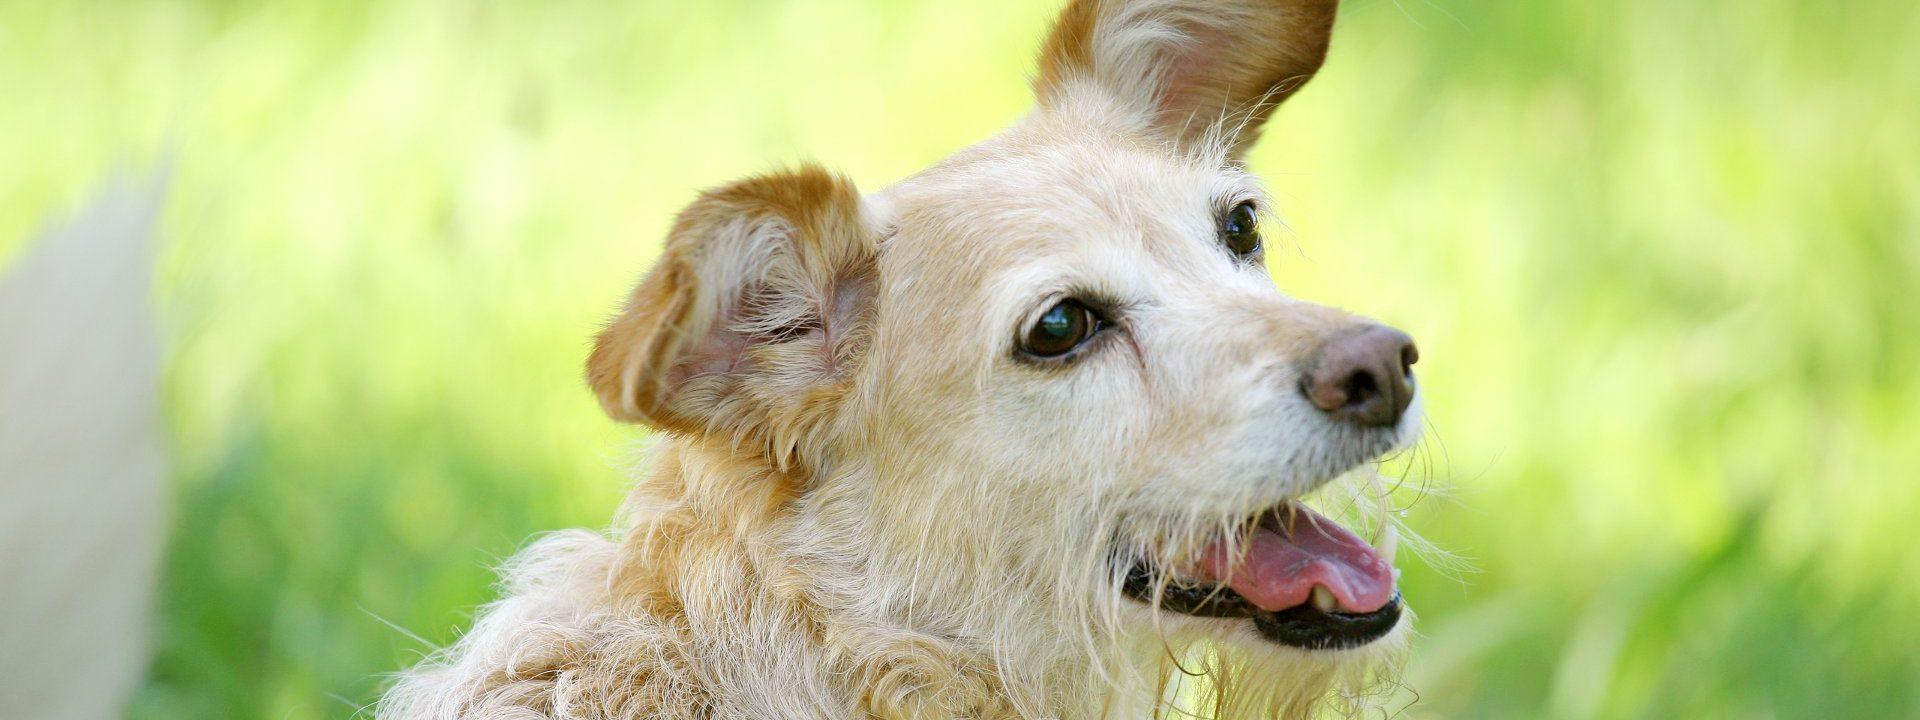 hundetraining-ablauf